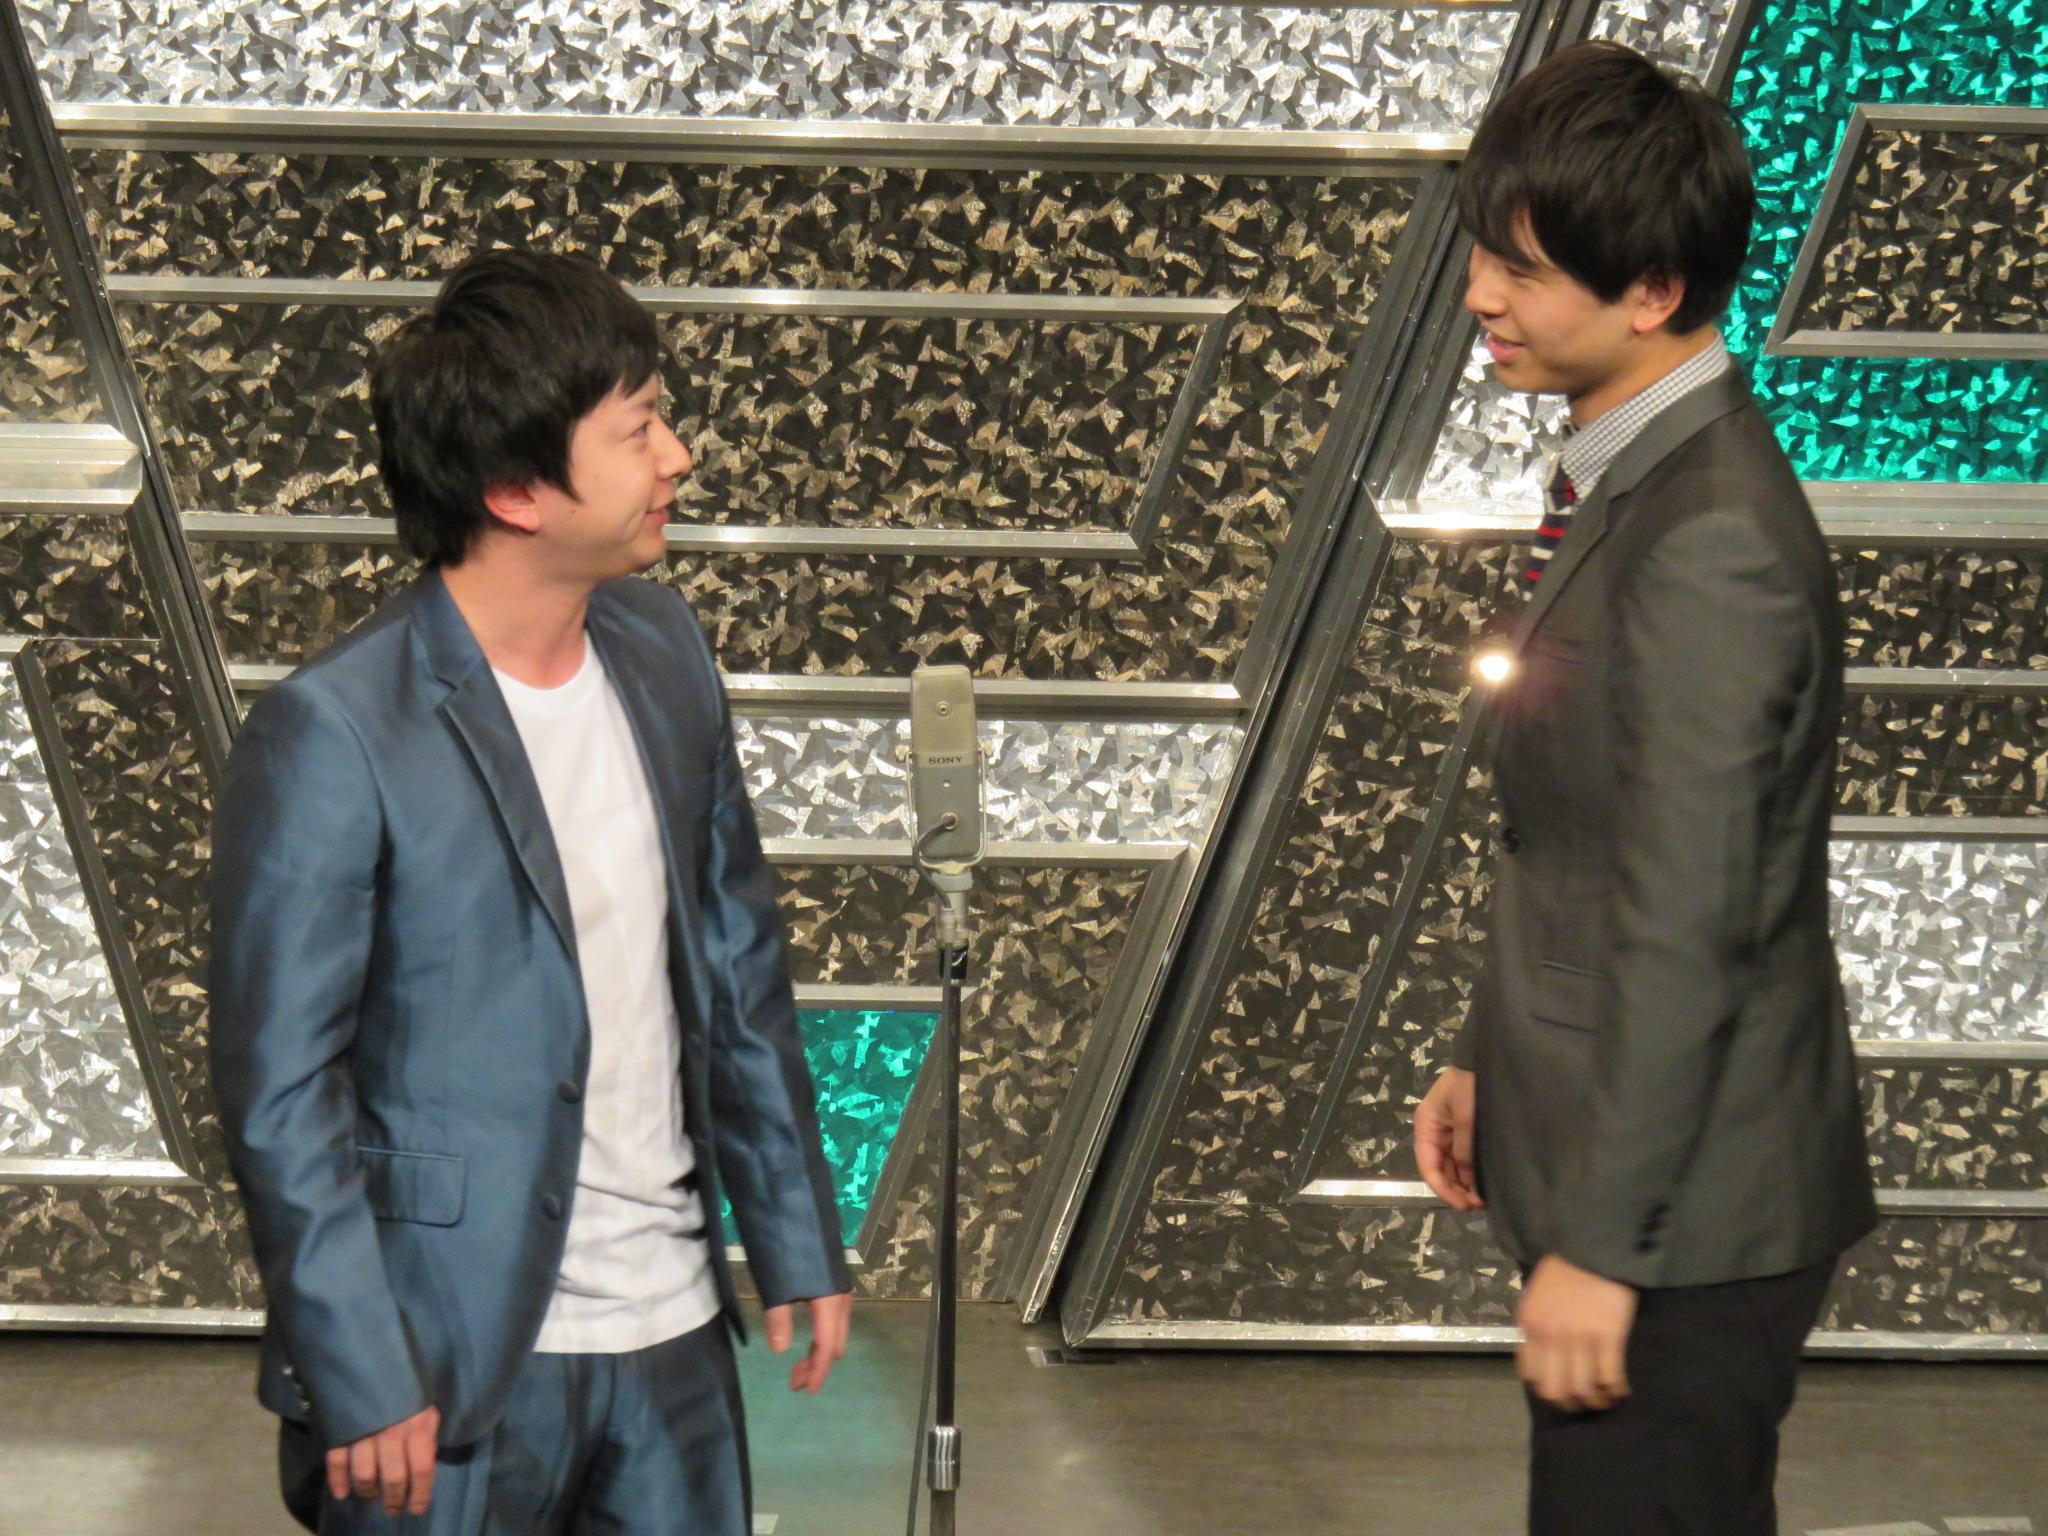 http://news.yoshimoto.co.jp/20151130224602-bb2d37b6aaab8aefee25be2e621a7de8dfaad059.jpg